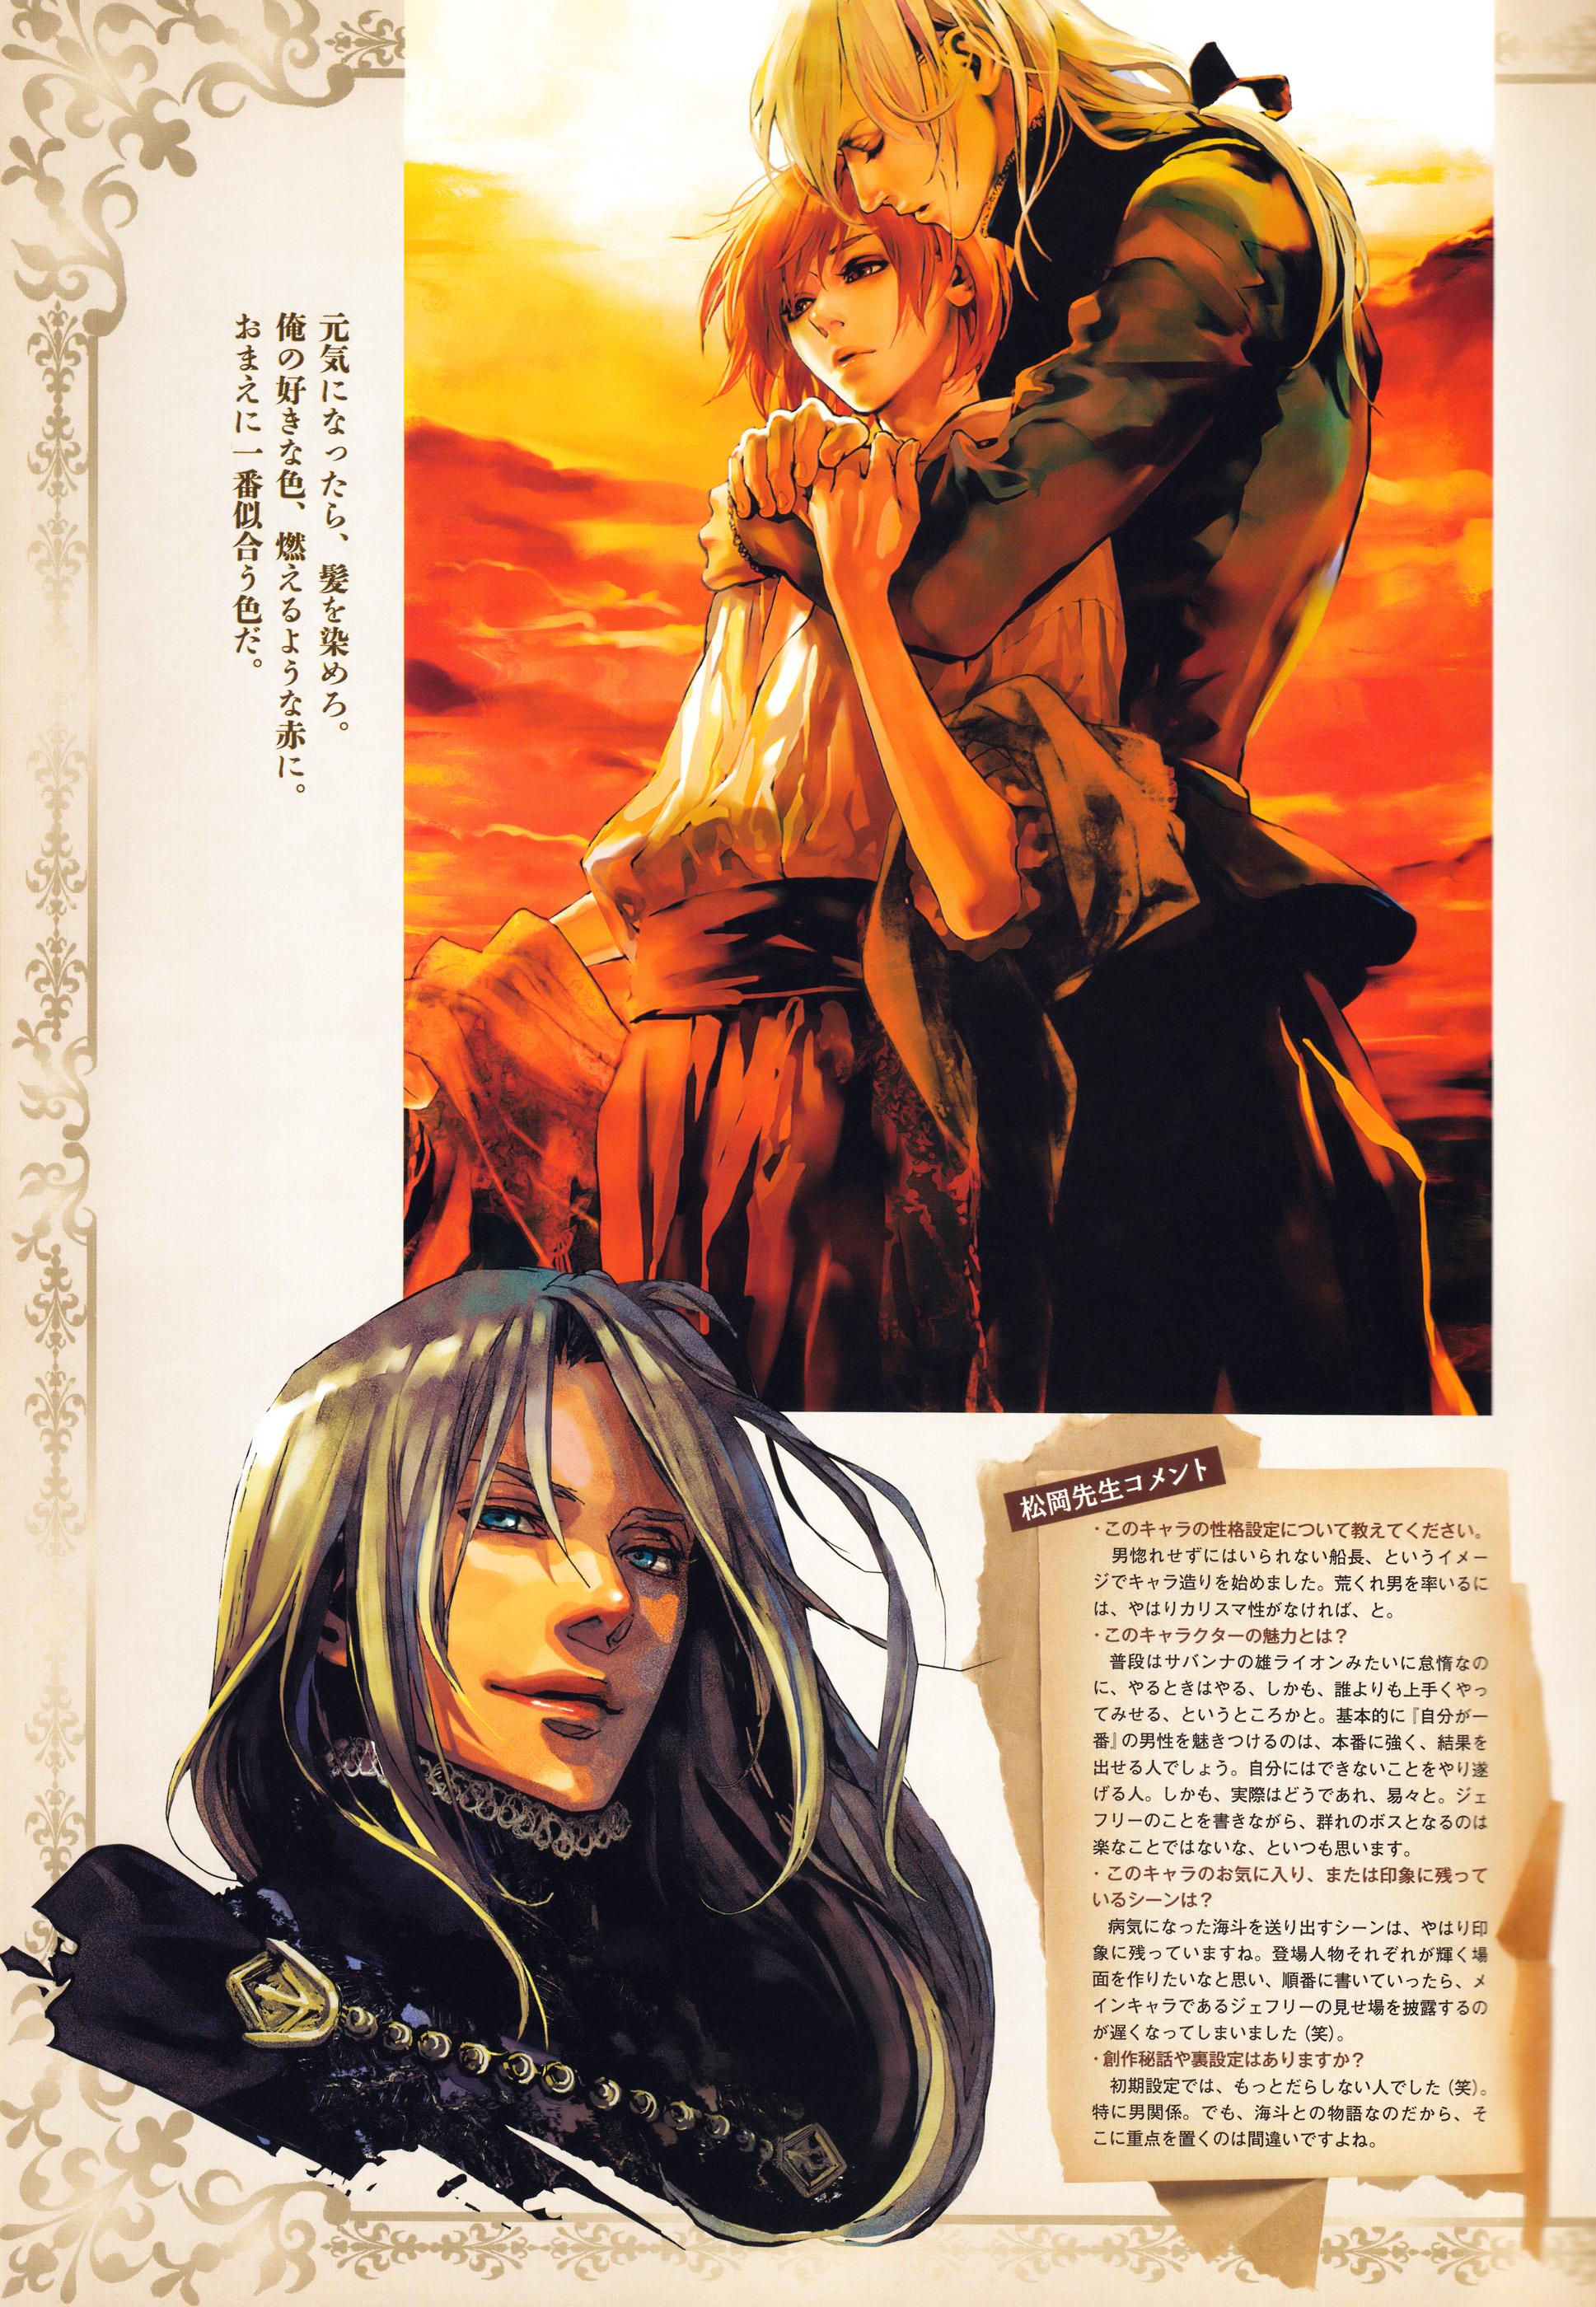 FLESH & BLOOD - Characters (4)